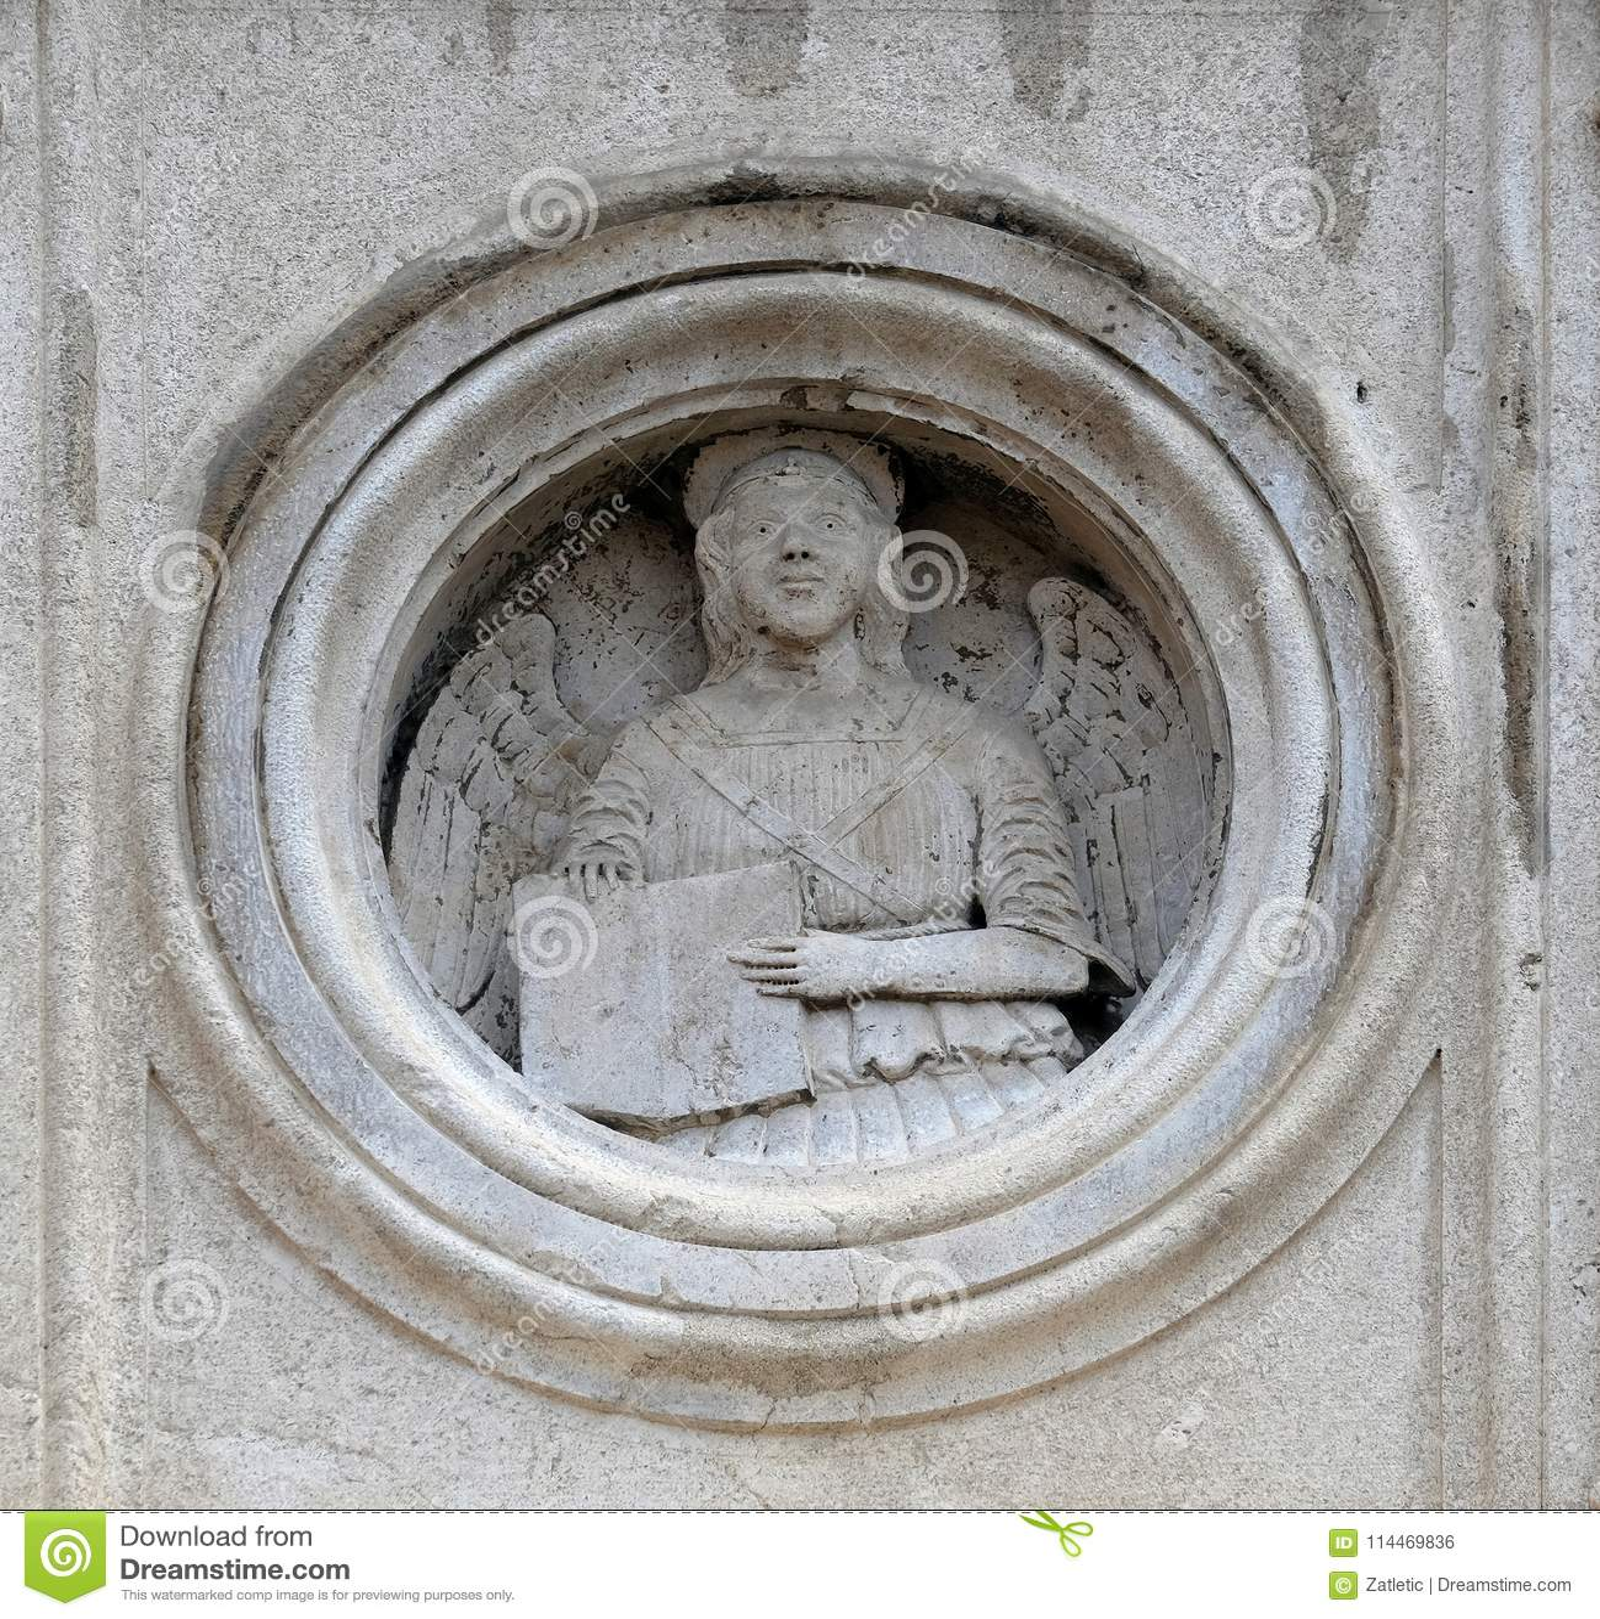 Symbol Of Saint Matthew The Evangelist Stock Photo Image Of